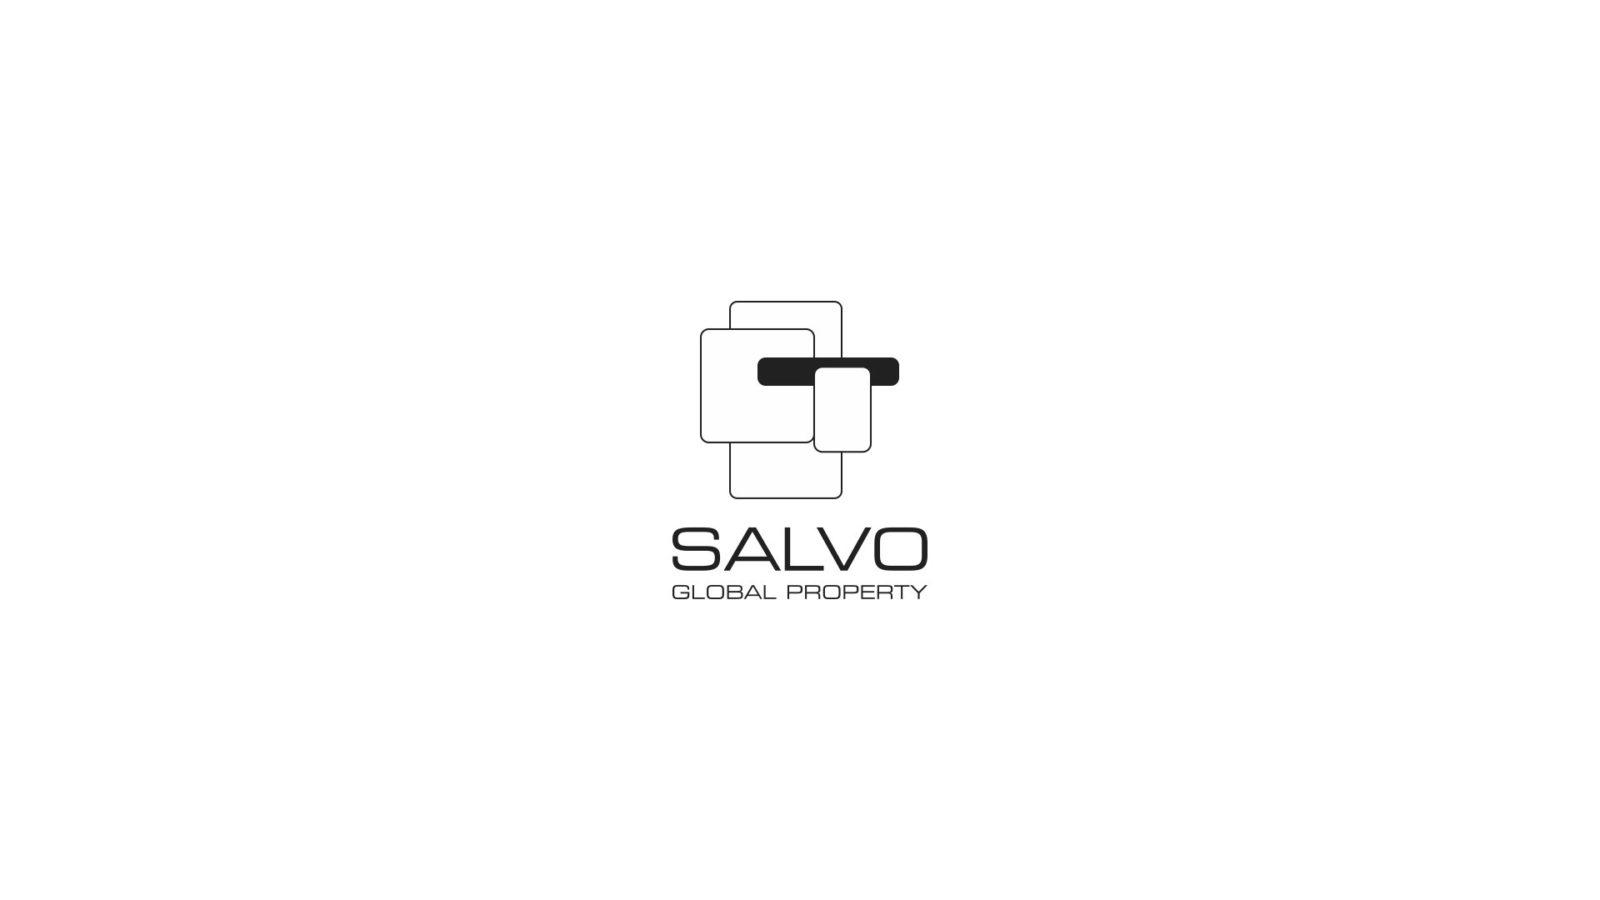 salvo global property inmobiliaria y gestion - Identidad gráfica | SALVO GLOBAL PROPERTY